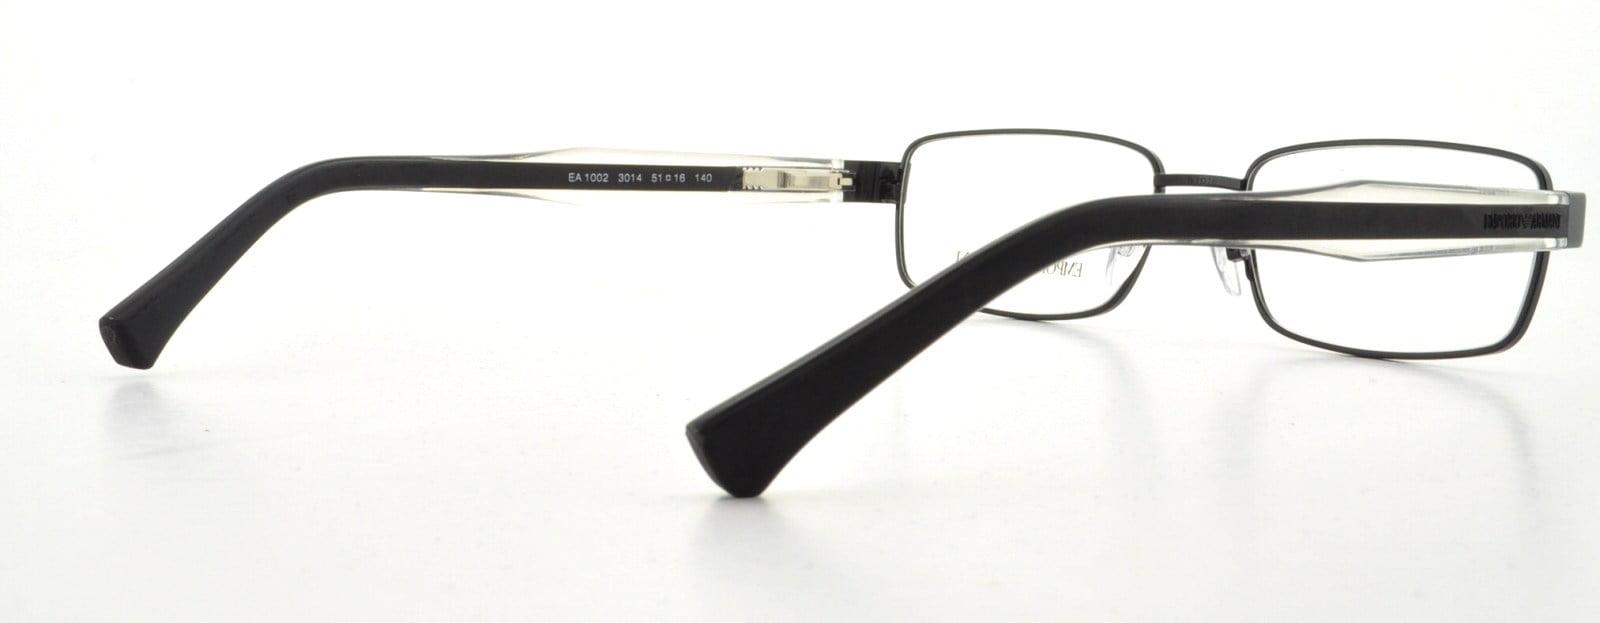 d3b34f35ee EMPORIO ARMANI Eyeglasses EA 1002 3014 Black 53MM - Walmart.com